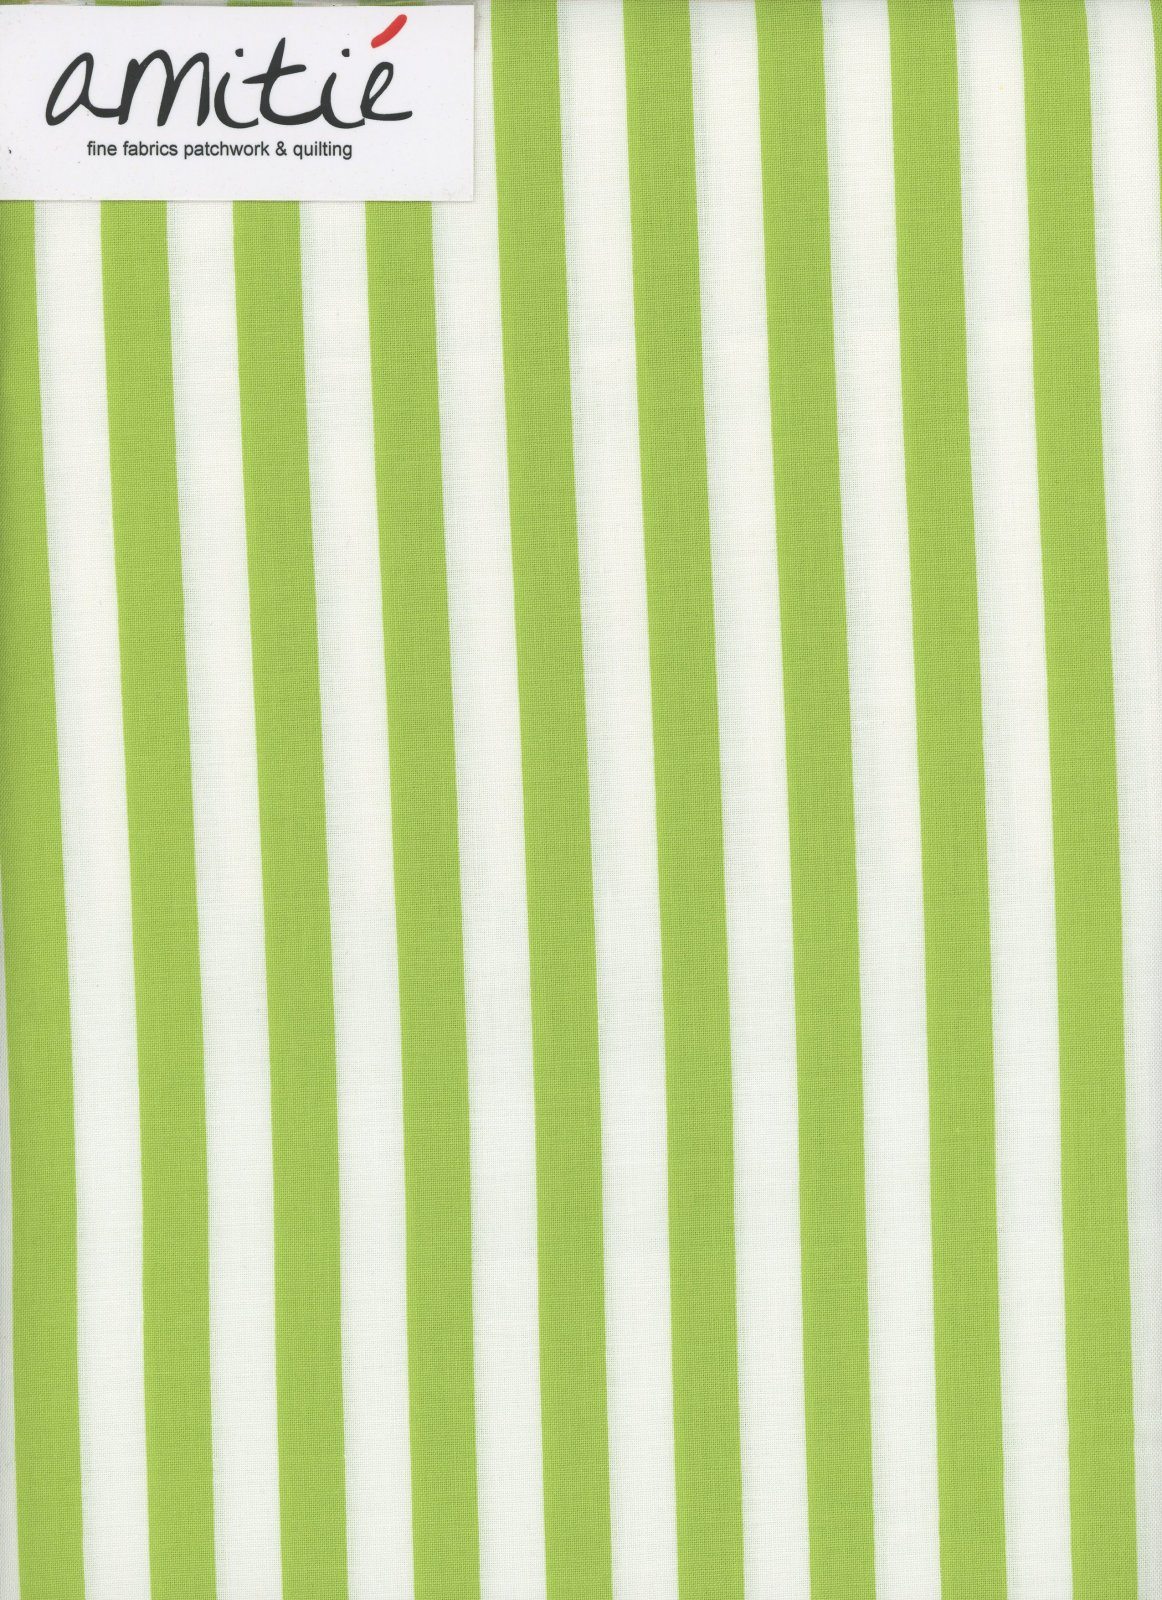 Le Creme - 1/2 Lime/Cream Stripe